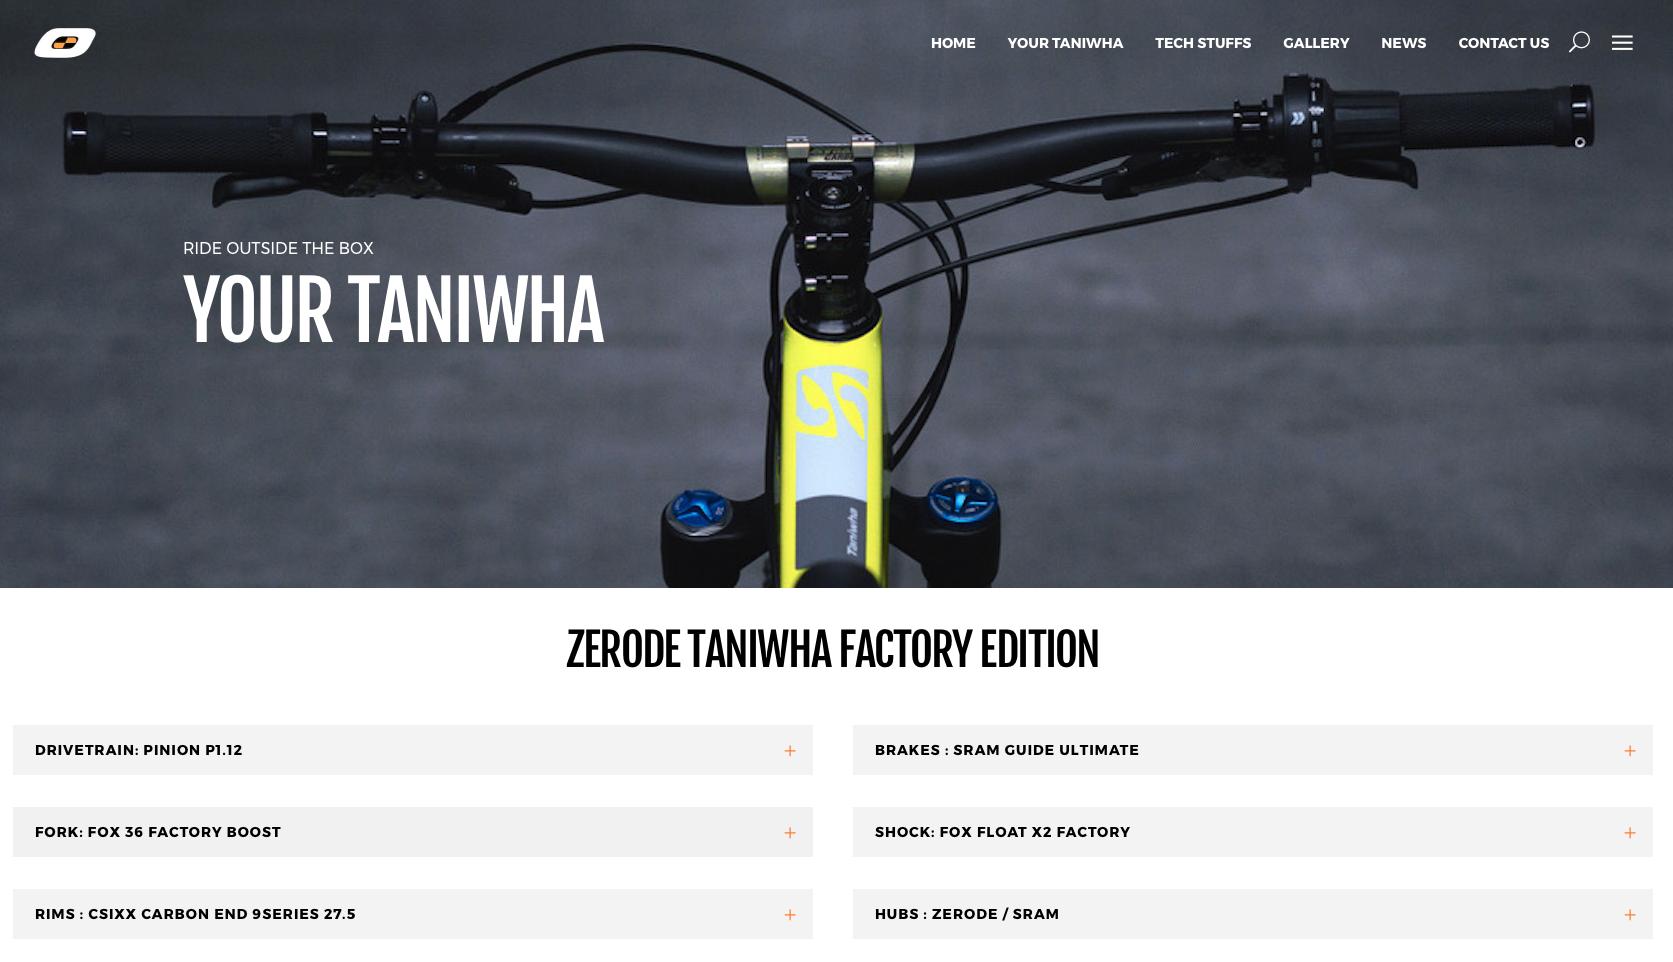 Zerode Taniwha website